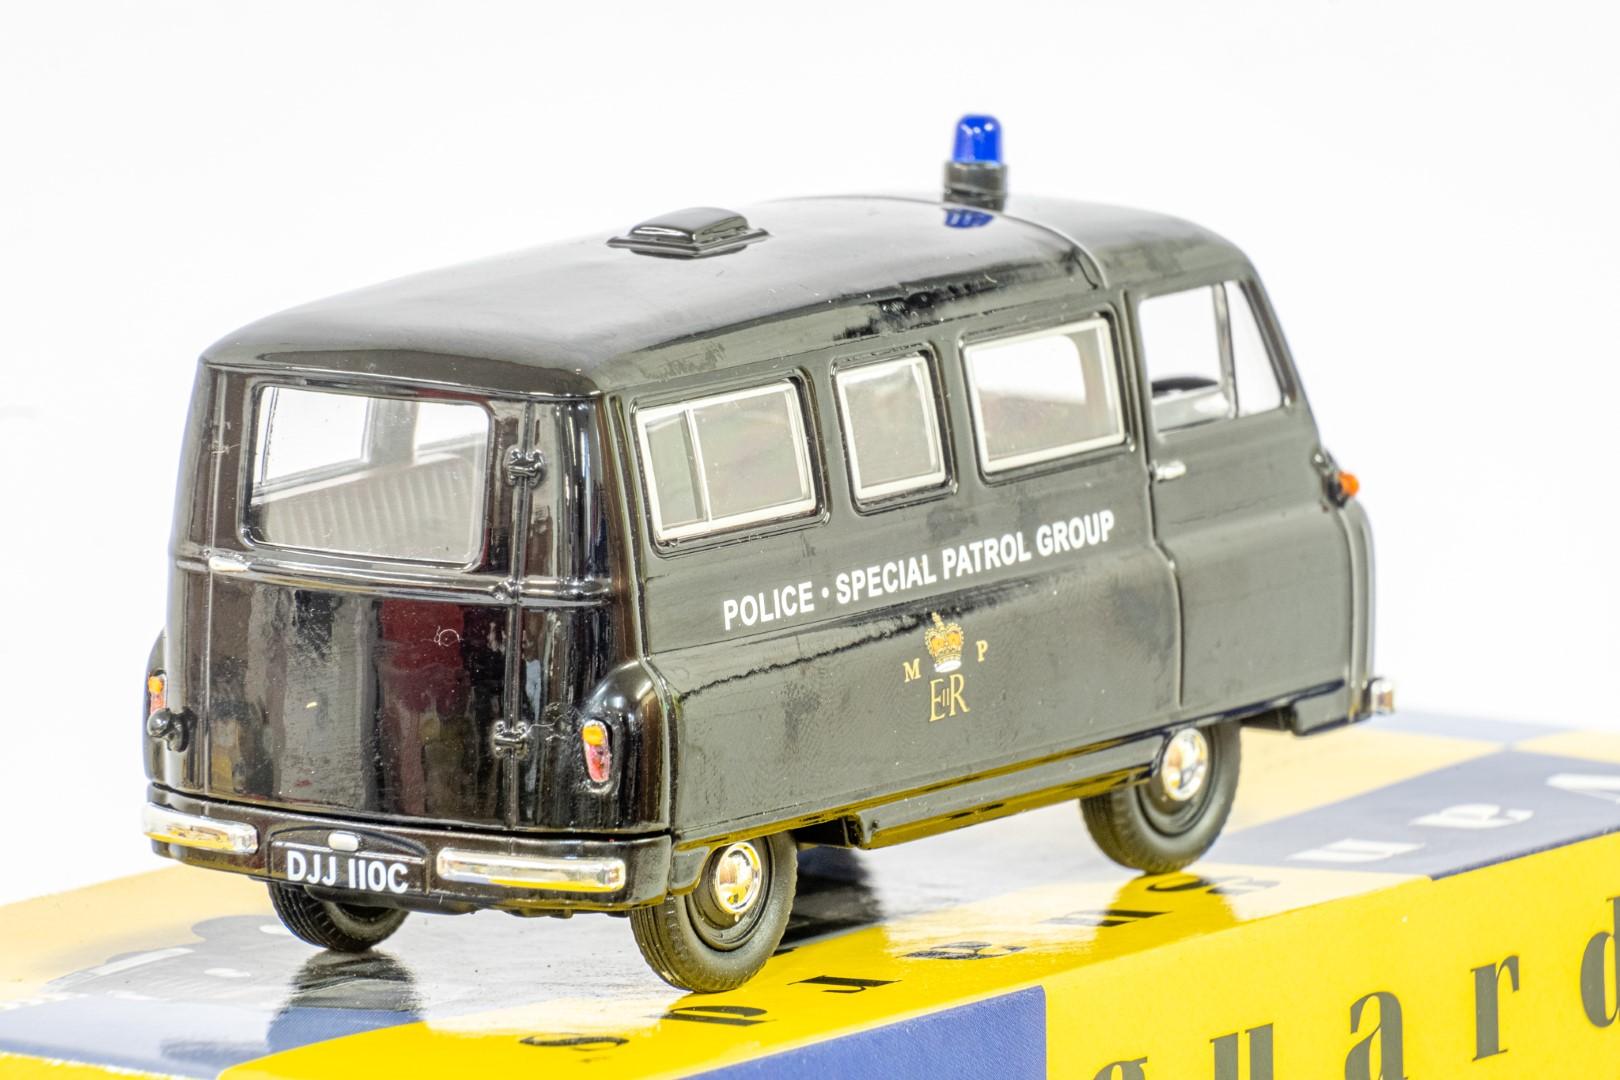 Vanguards Morris J2 Minibus - Metropolitan Police SPG - Image 6 of 6